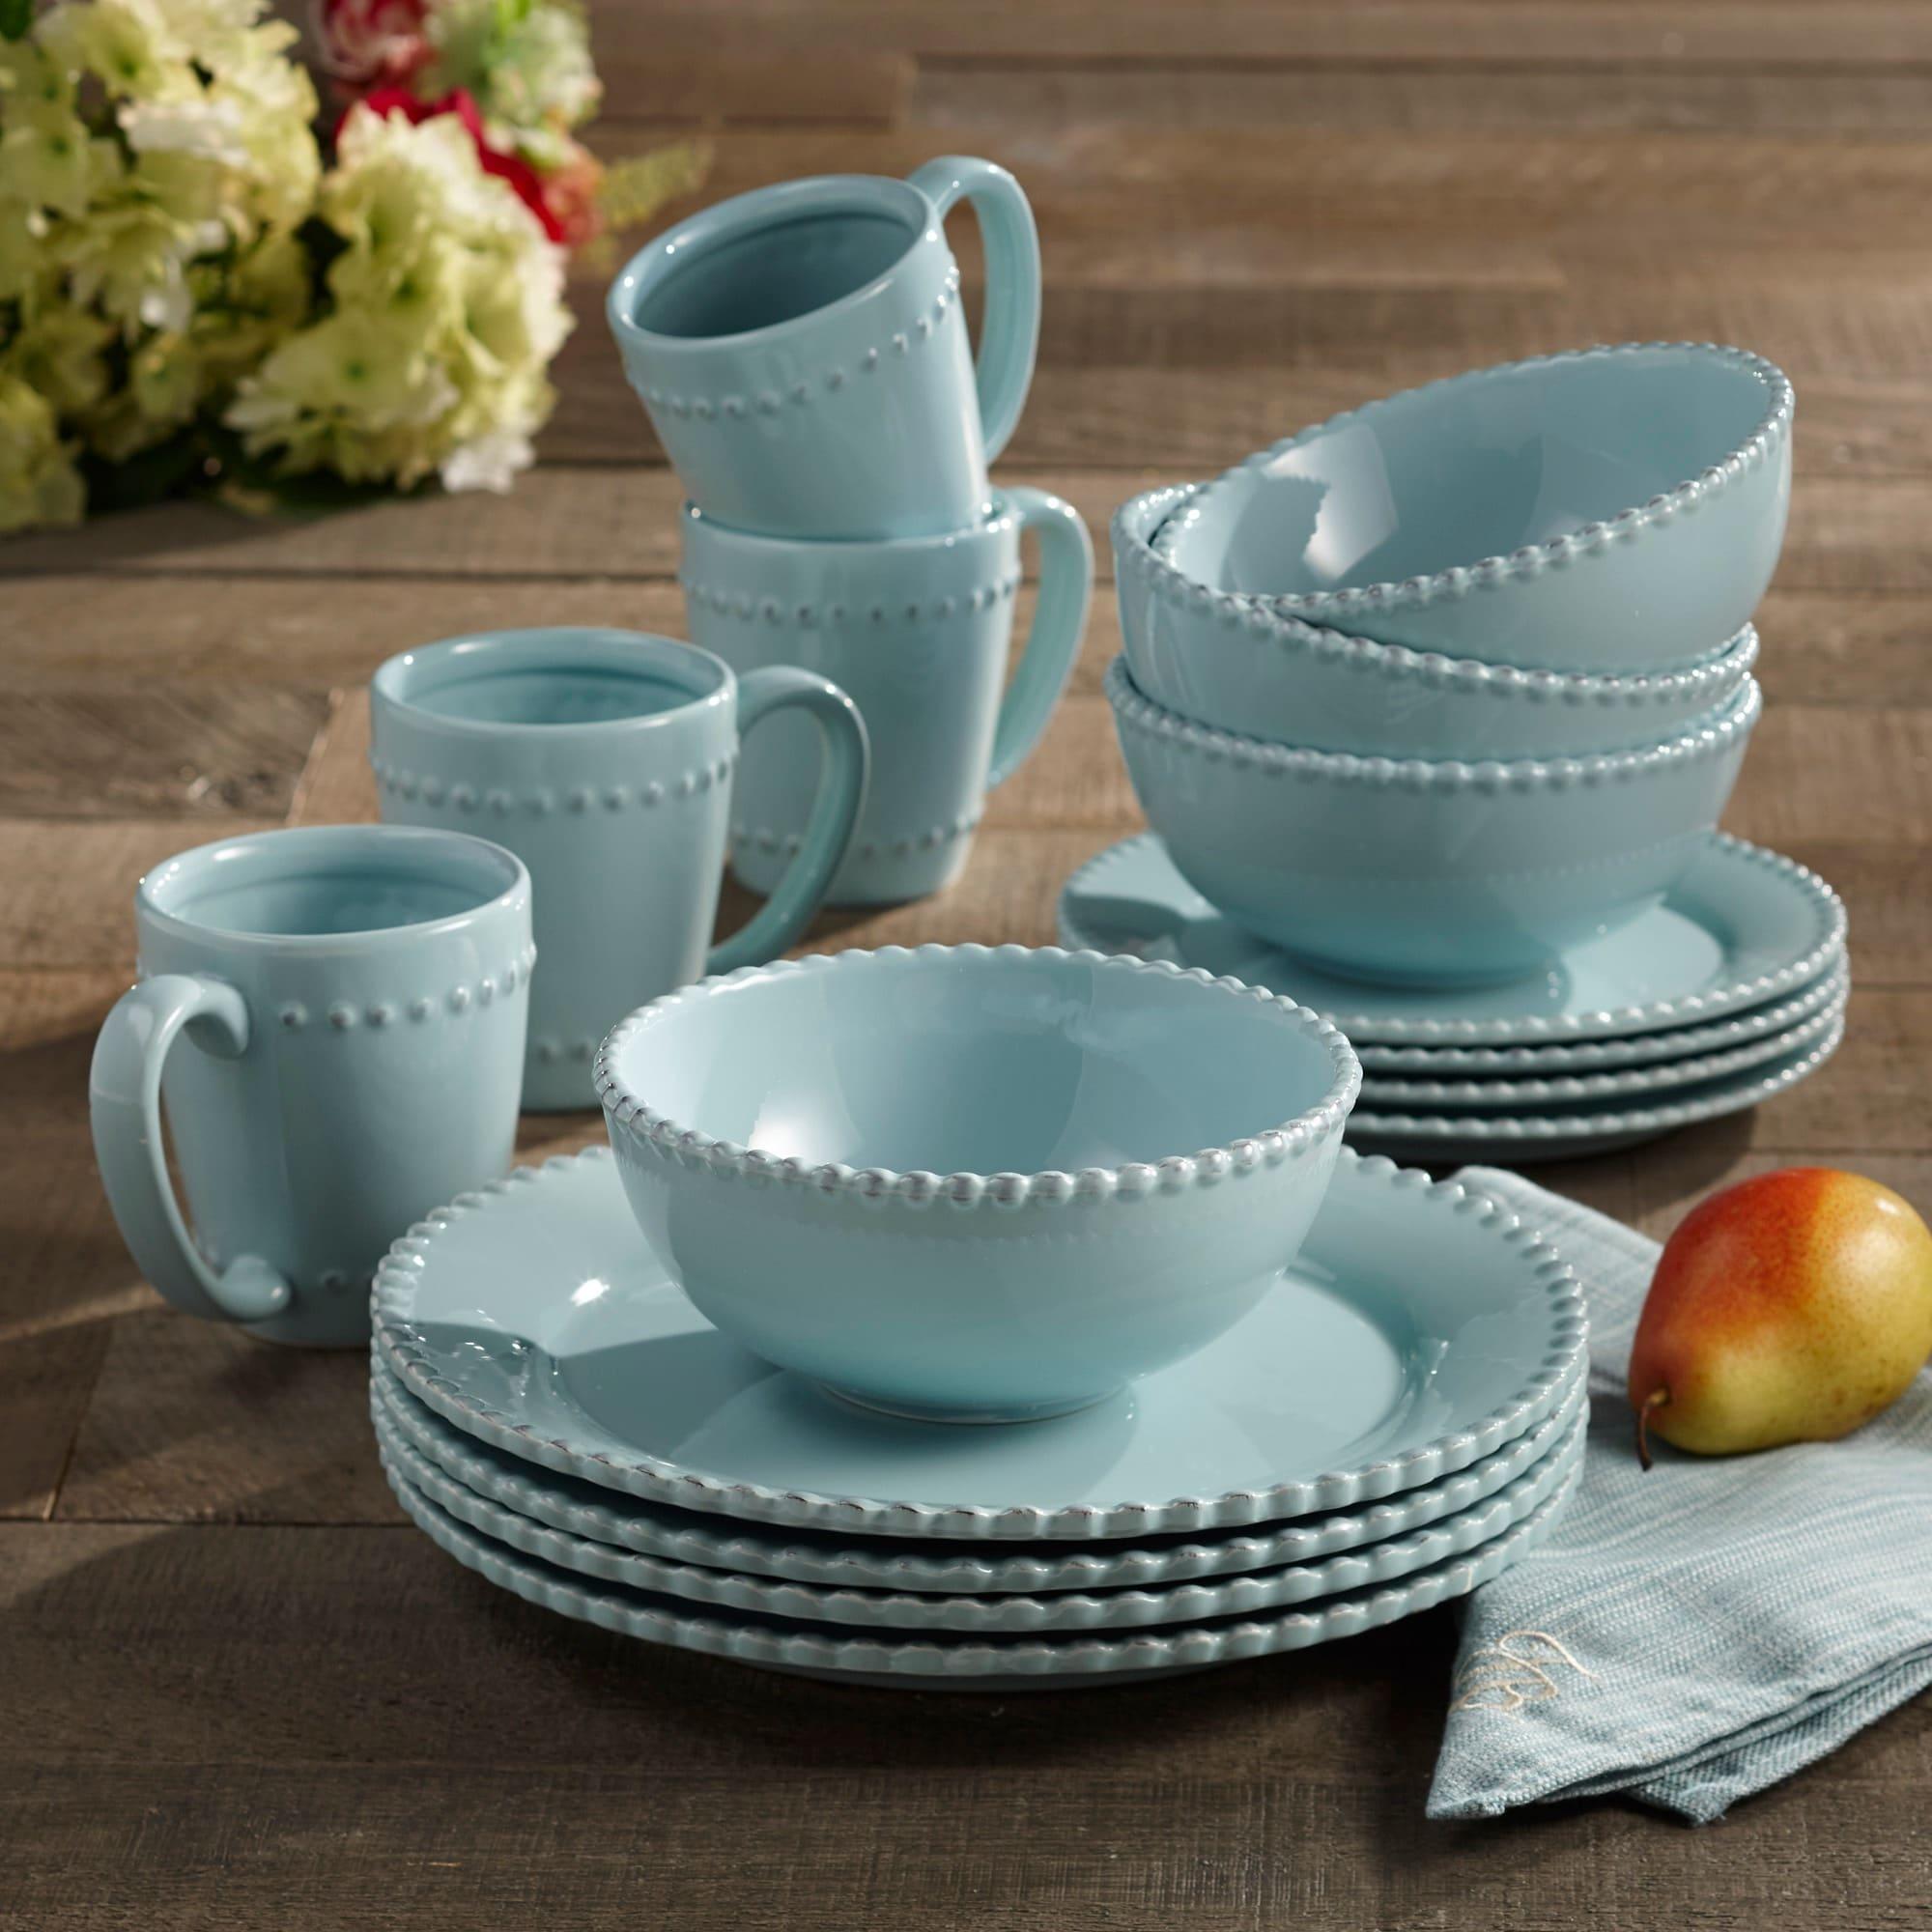 American Atelier Bianca Bead Azul 16-pc Dinnerware Set - Free Shipping Today - Overstock.com - 13858636 & American Atelier Bianca Bead Azul 16-pc Dinnerware Set - Free ...